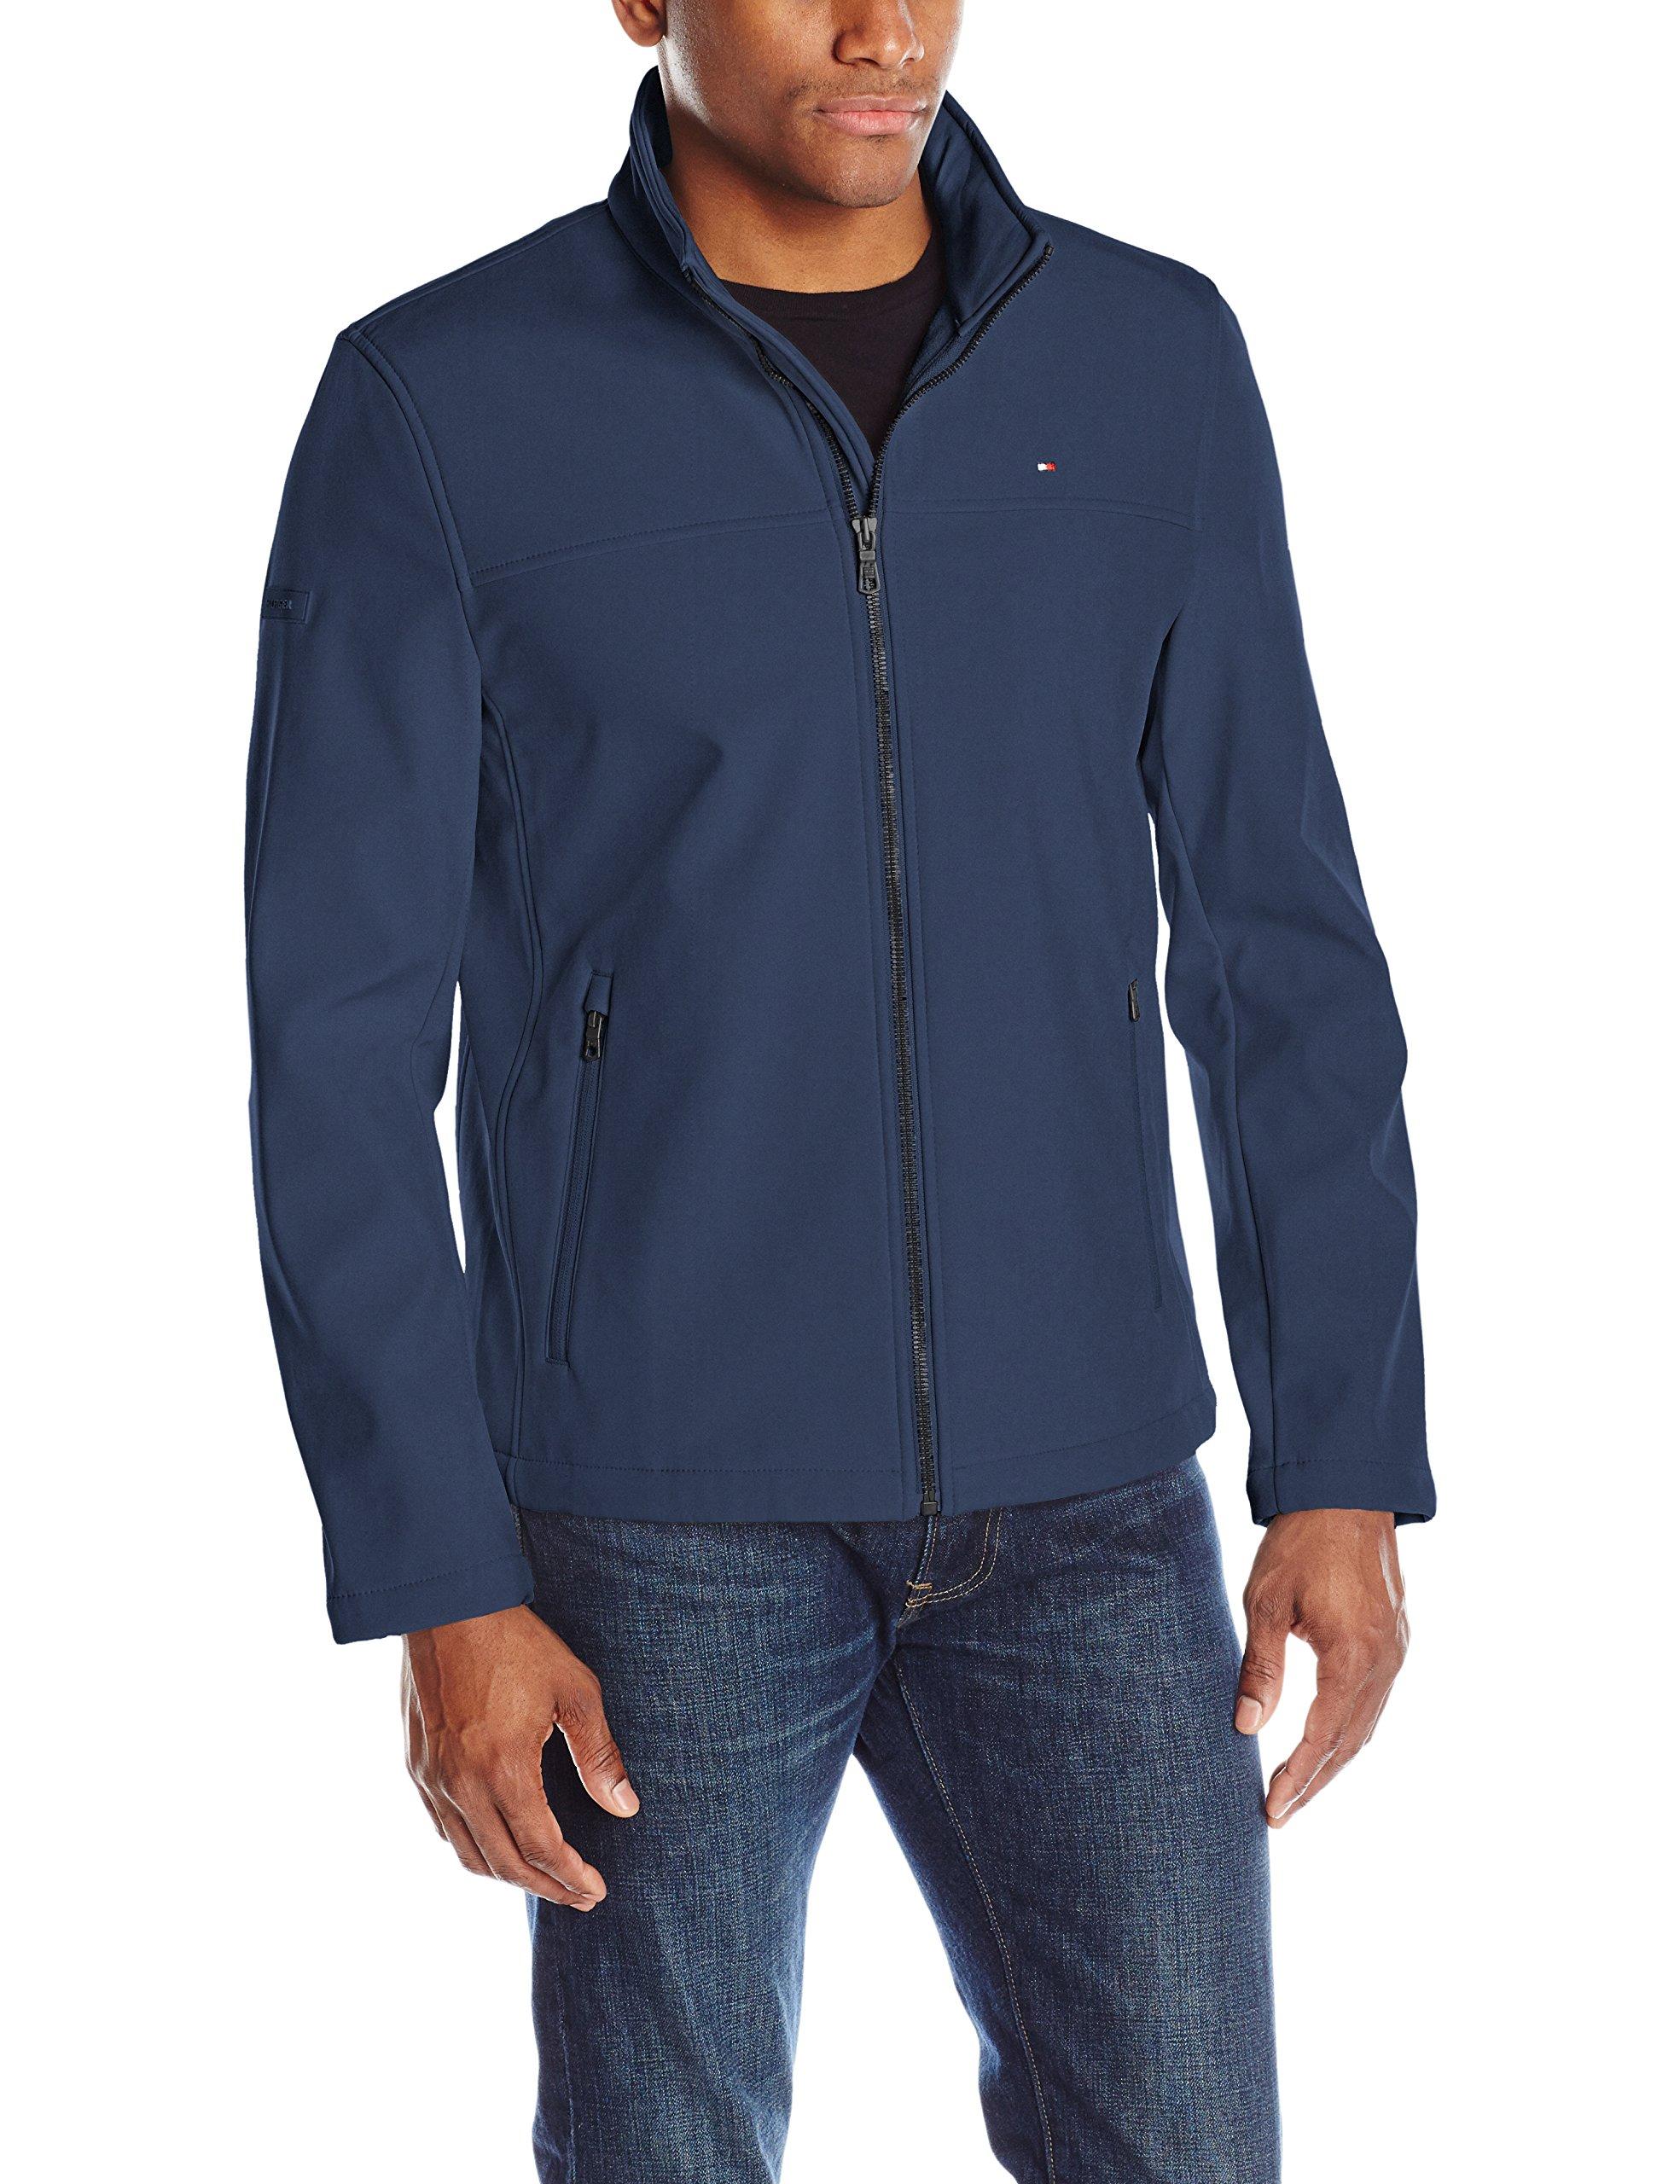 Tommy Hilfiger Men's Classic Soft Shell Jacket, Navy, Large